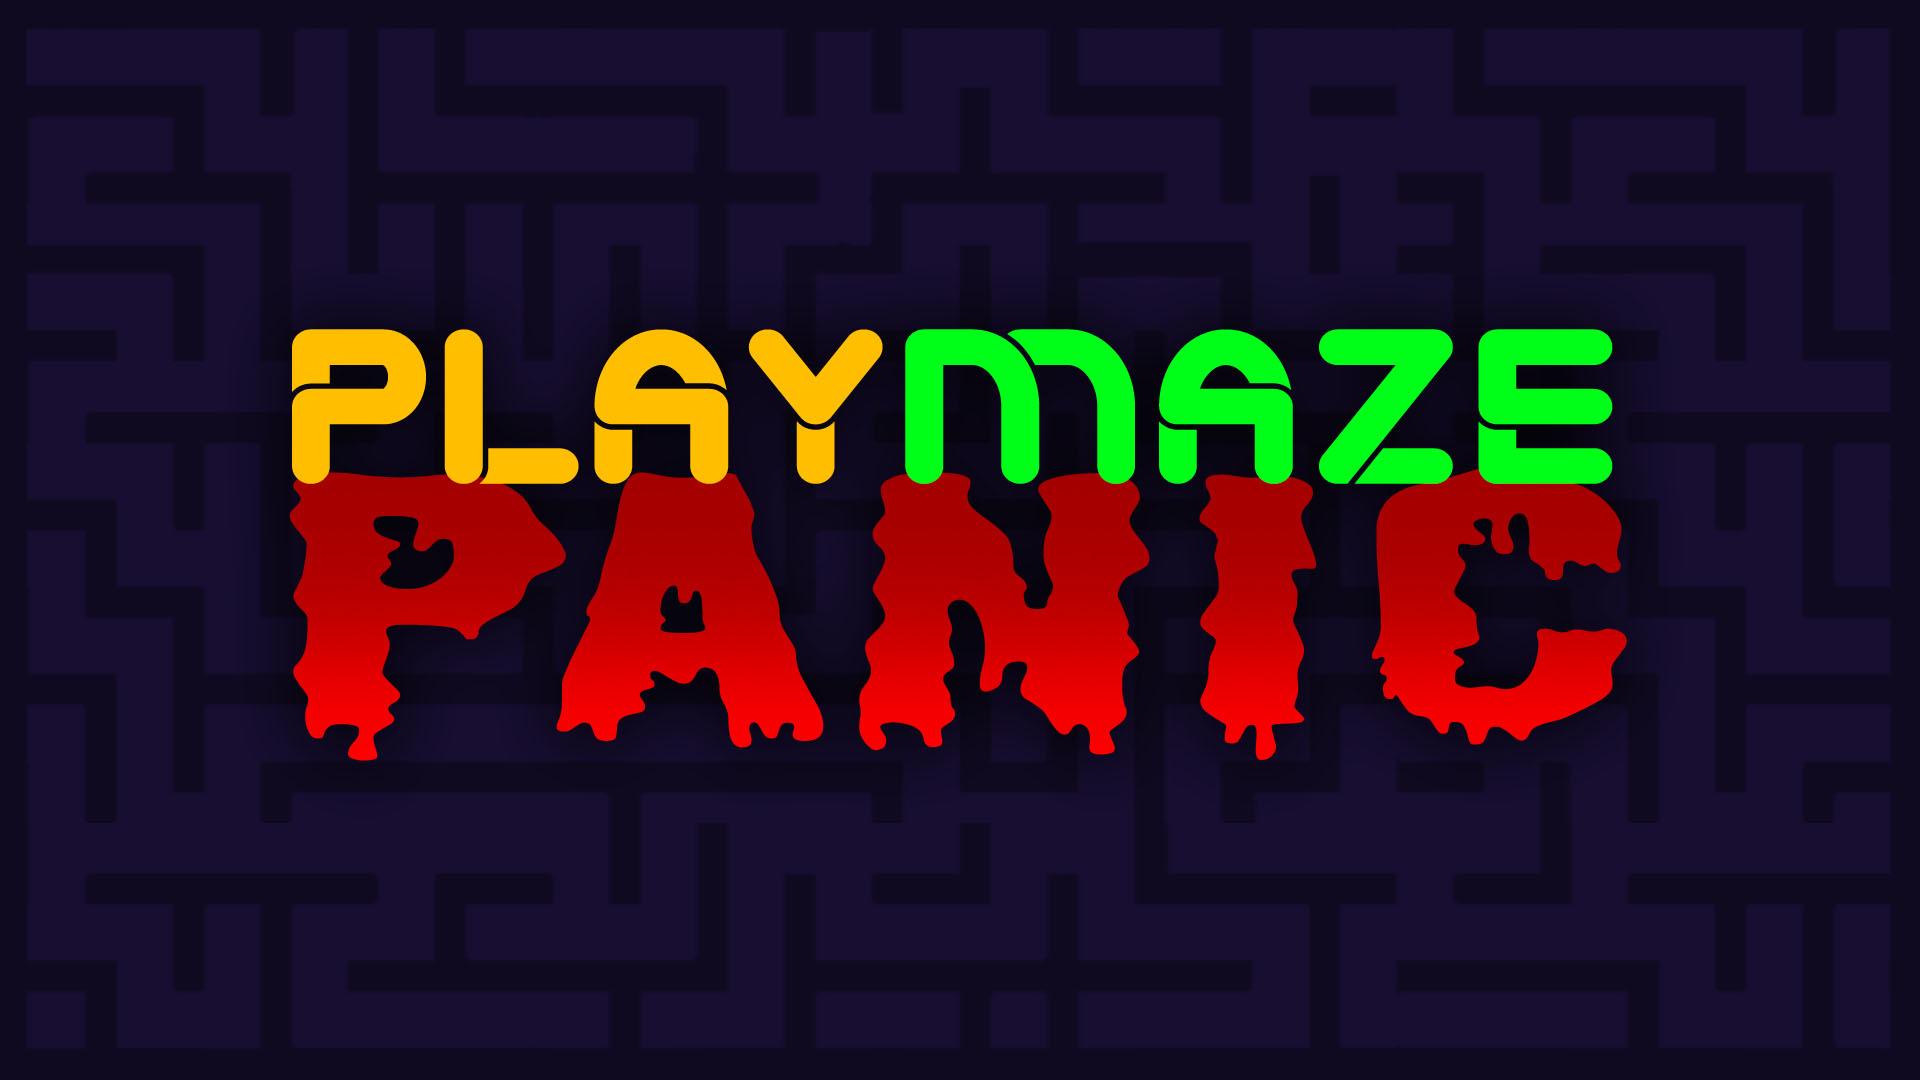 Playmaze Panic